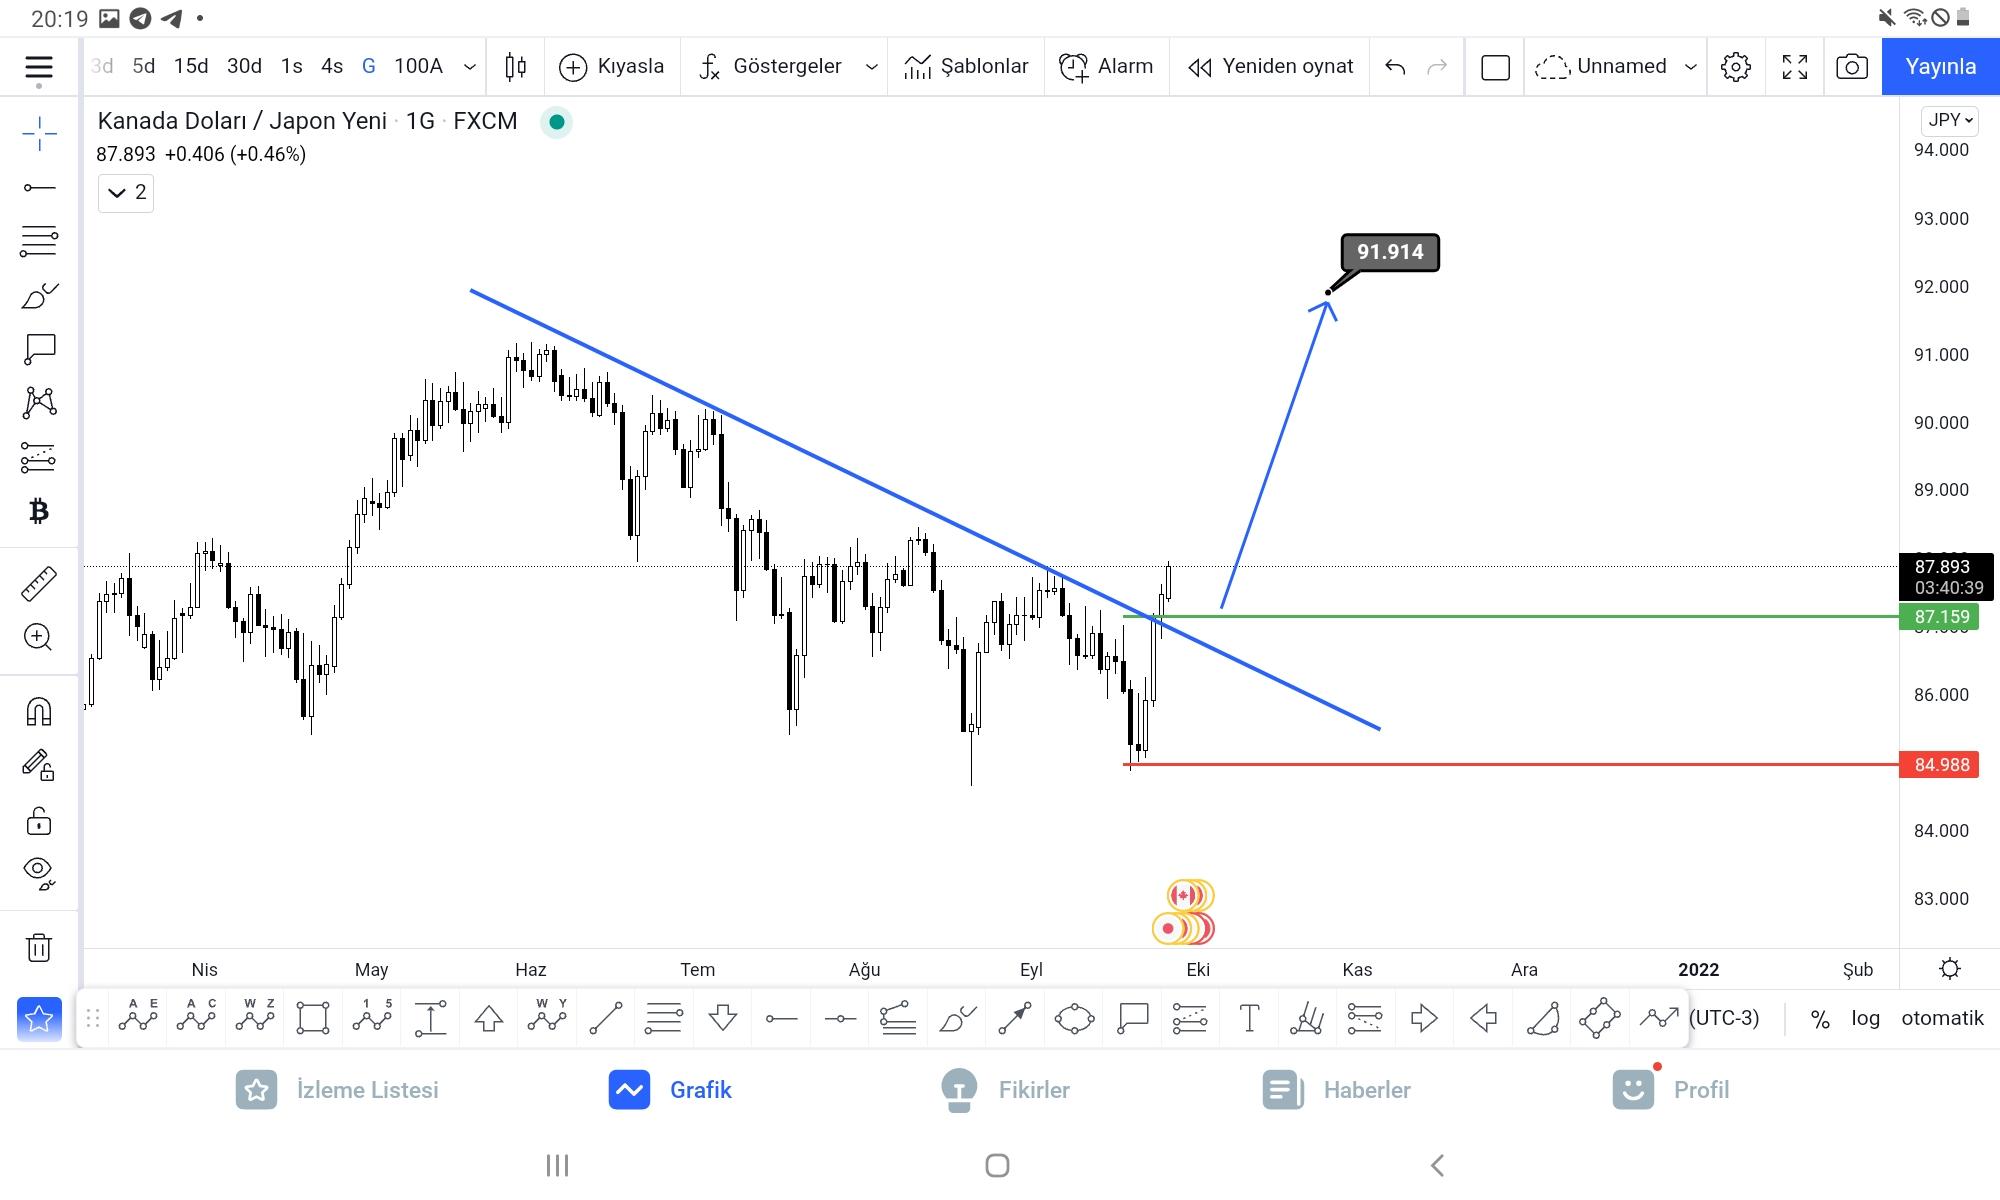 analysis_featured_imd